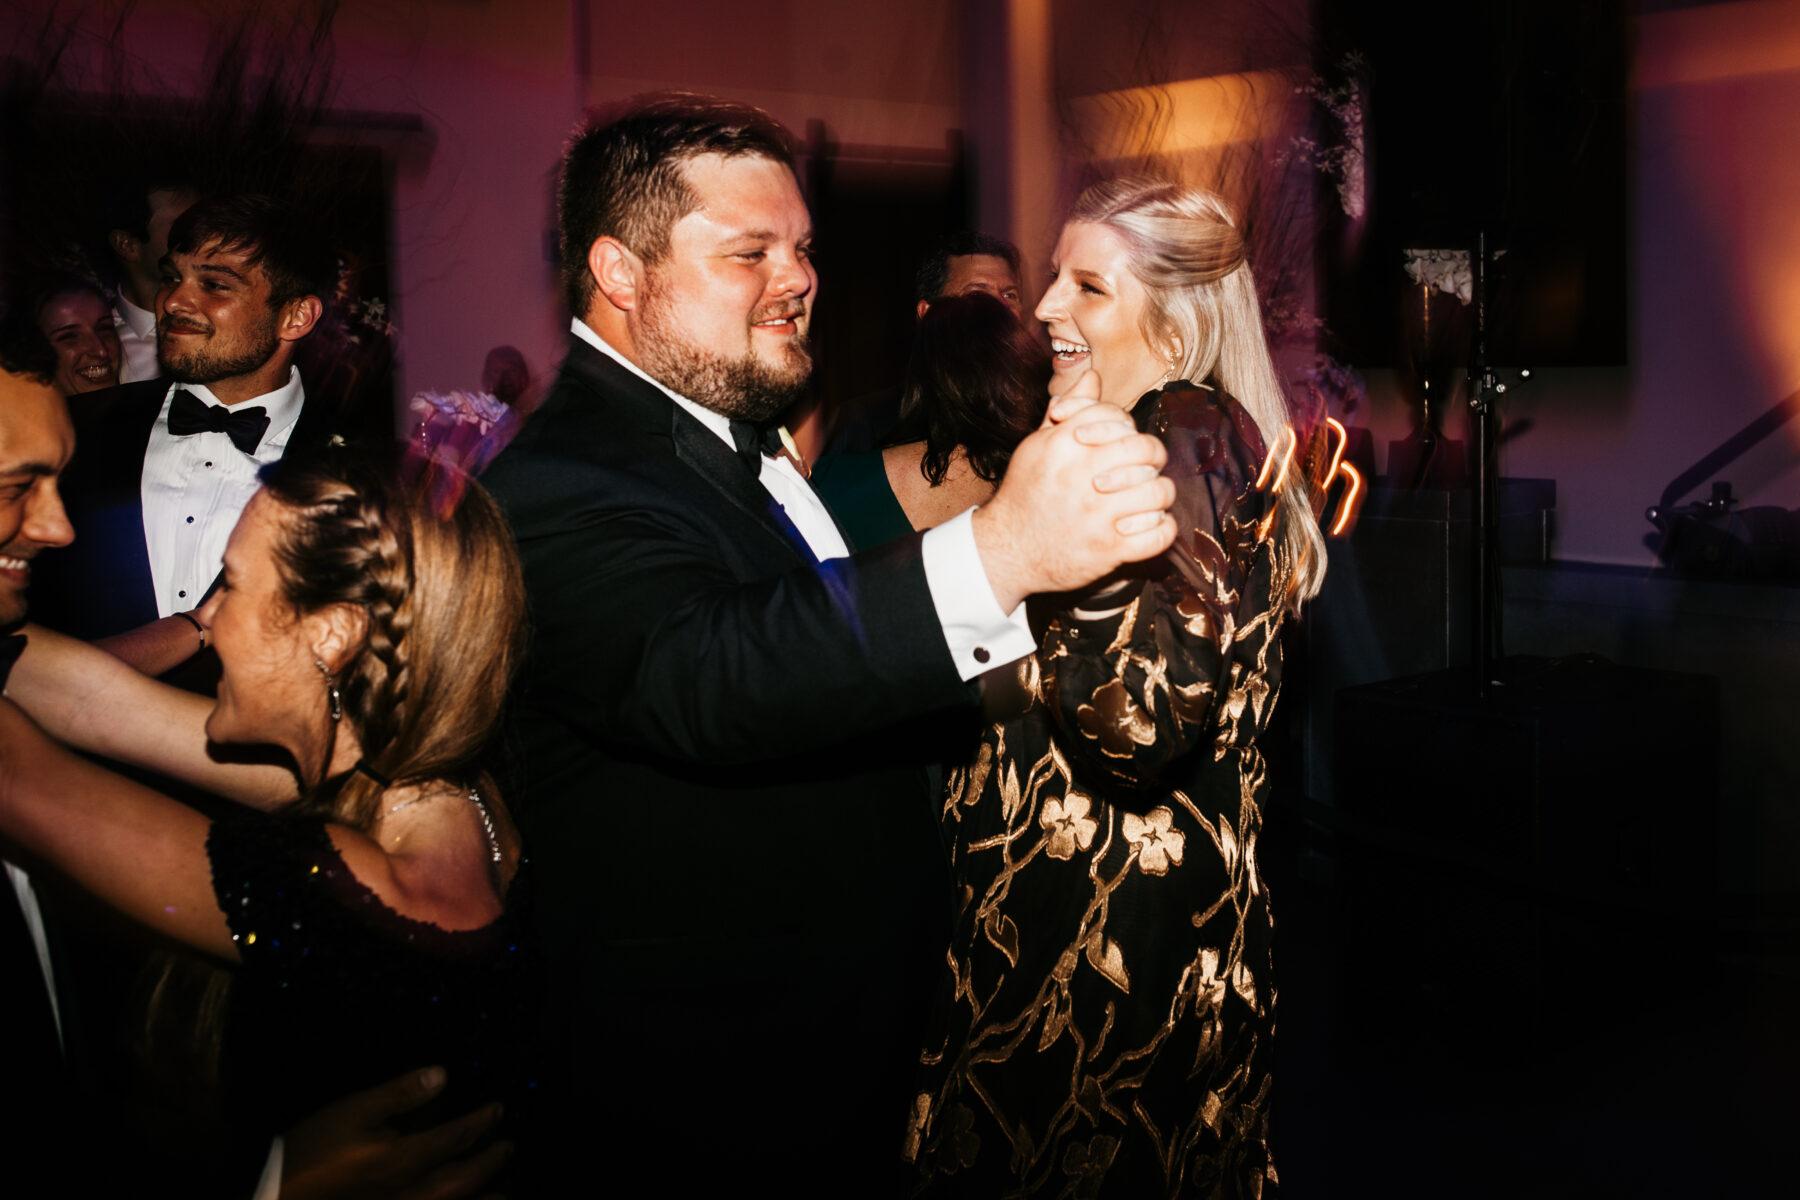 Steph Sorenson Nashville wedding photography | Nashville Bride Guide